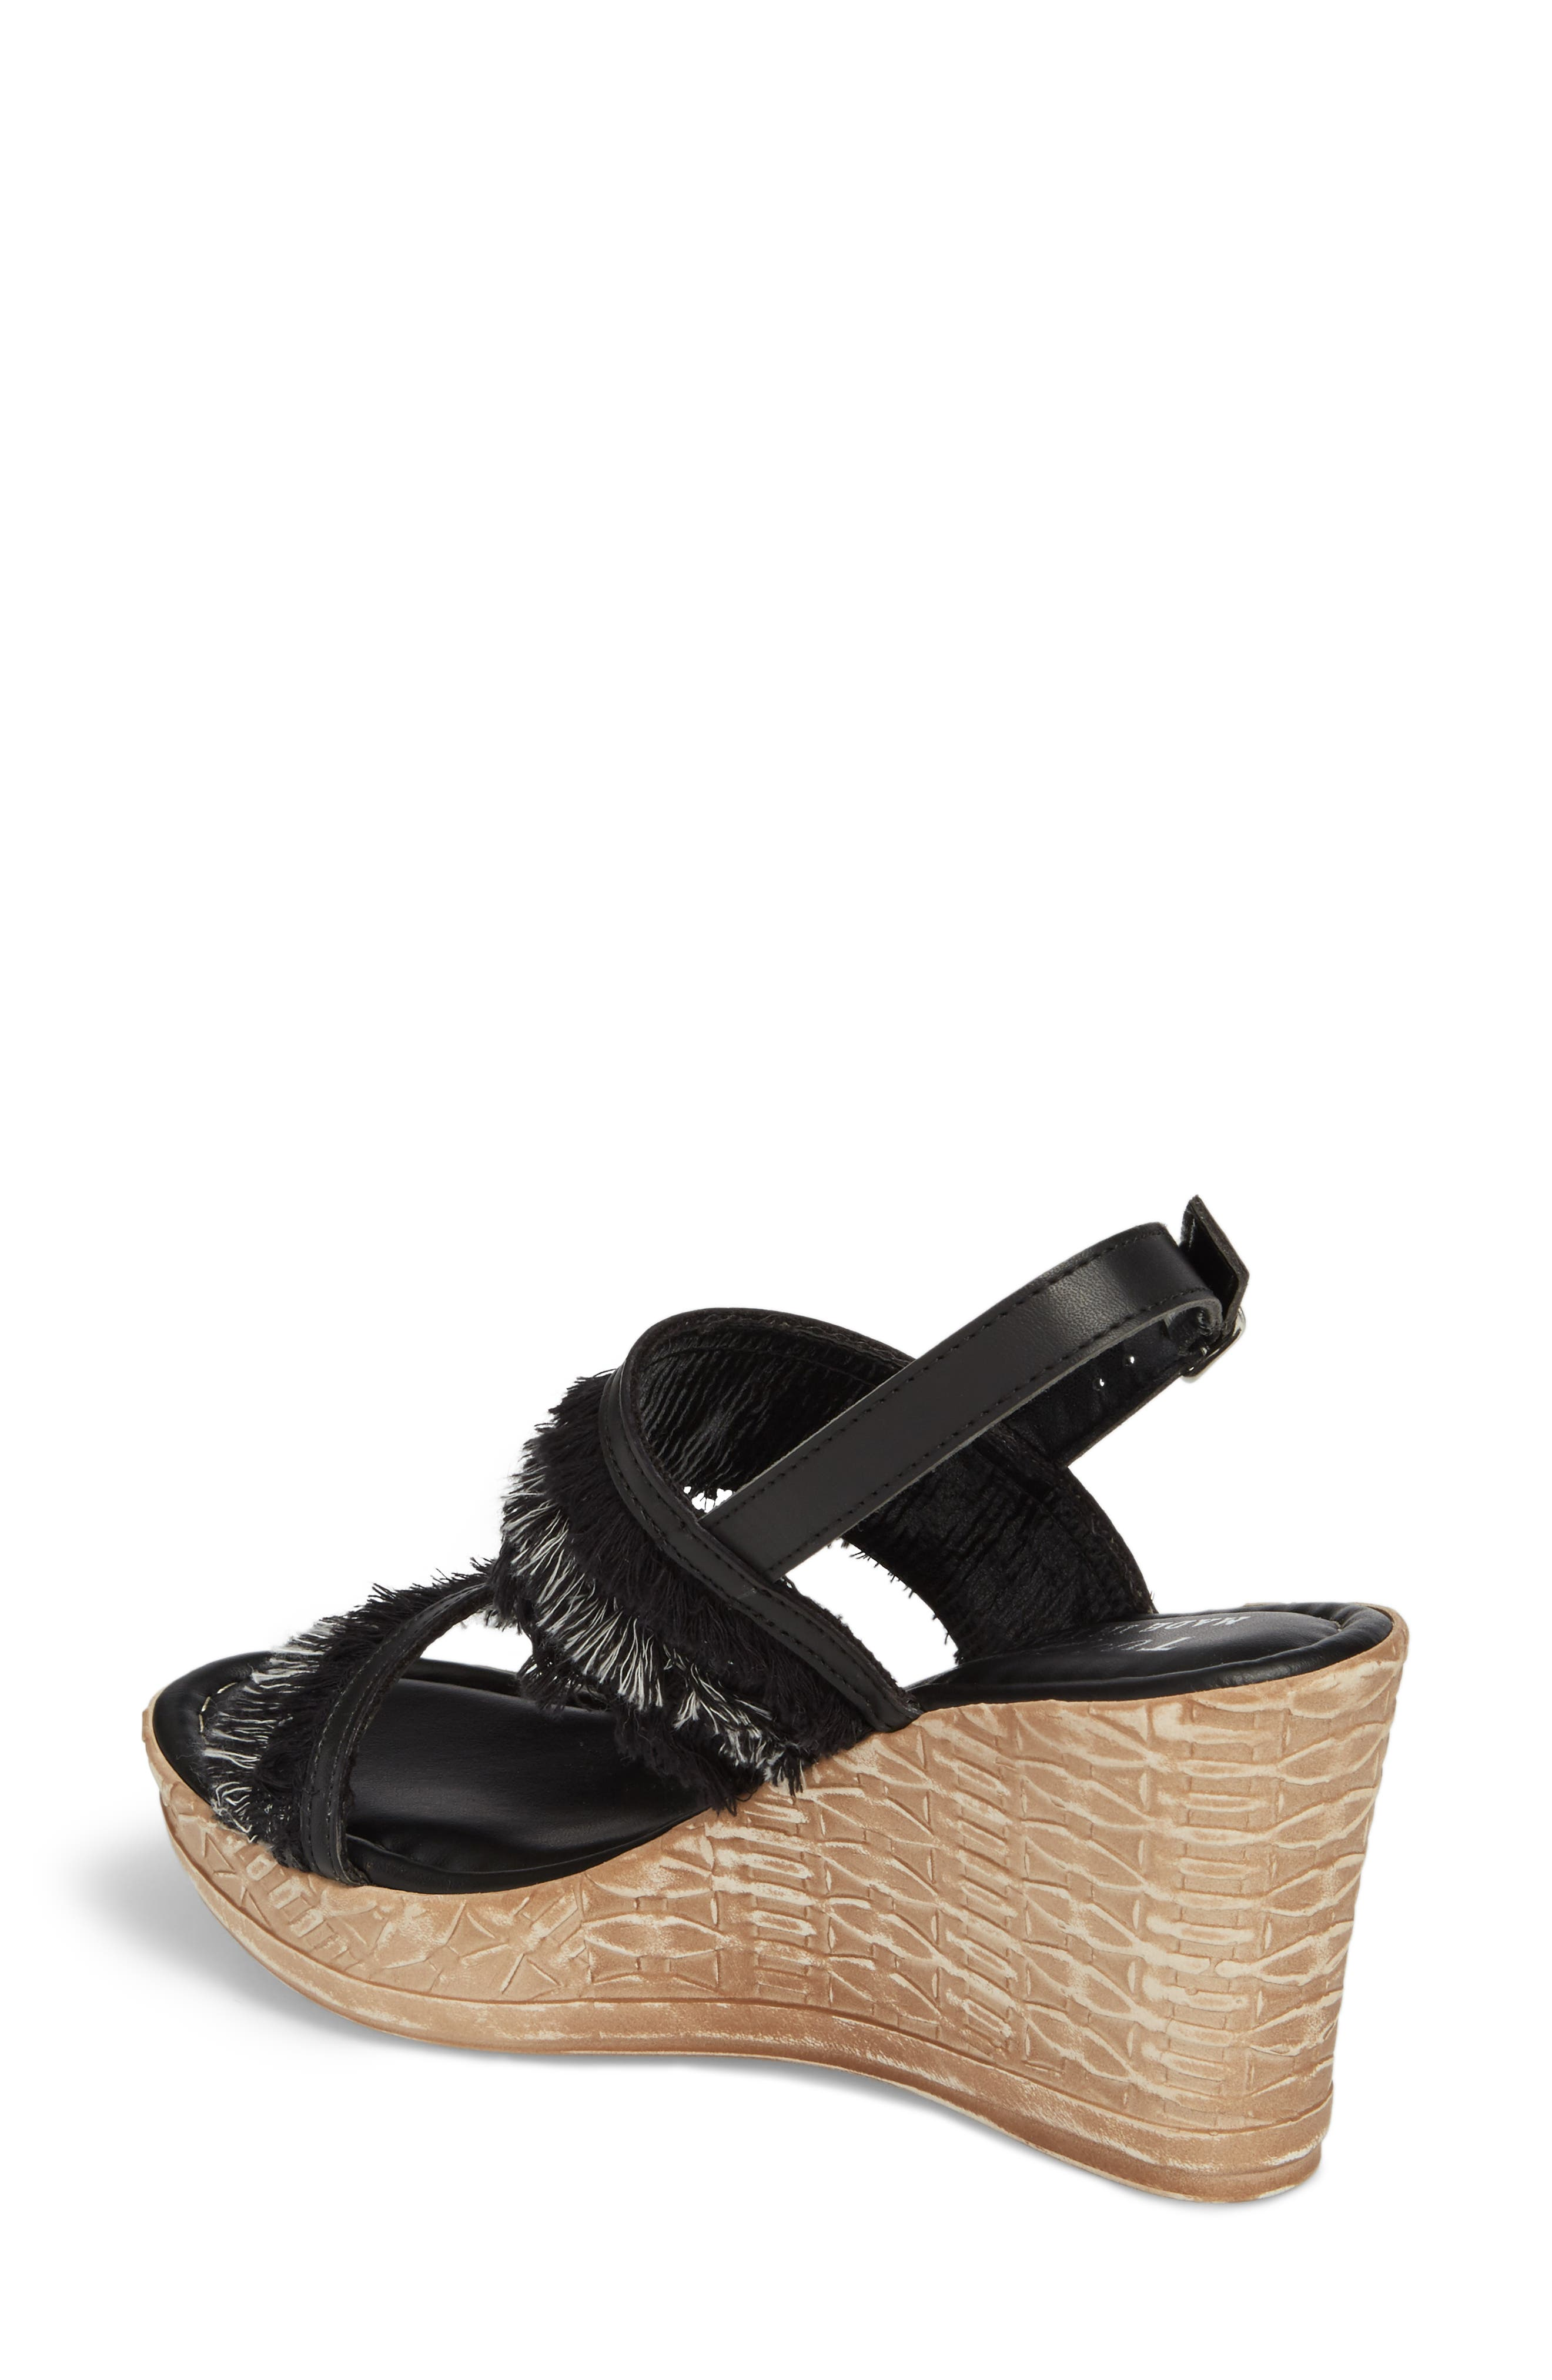 Zaira Wedge Espadrille Sandal,                             Alternate thumbnail 2, color,                             BLACK FAUX LEATHER